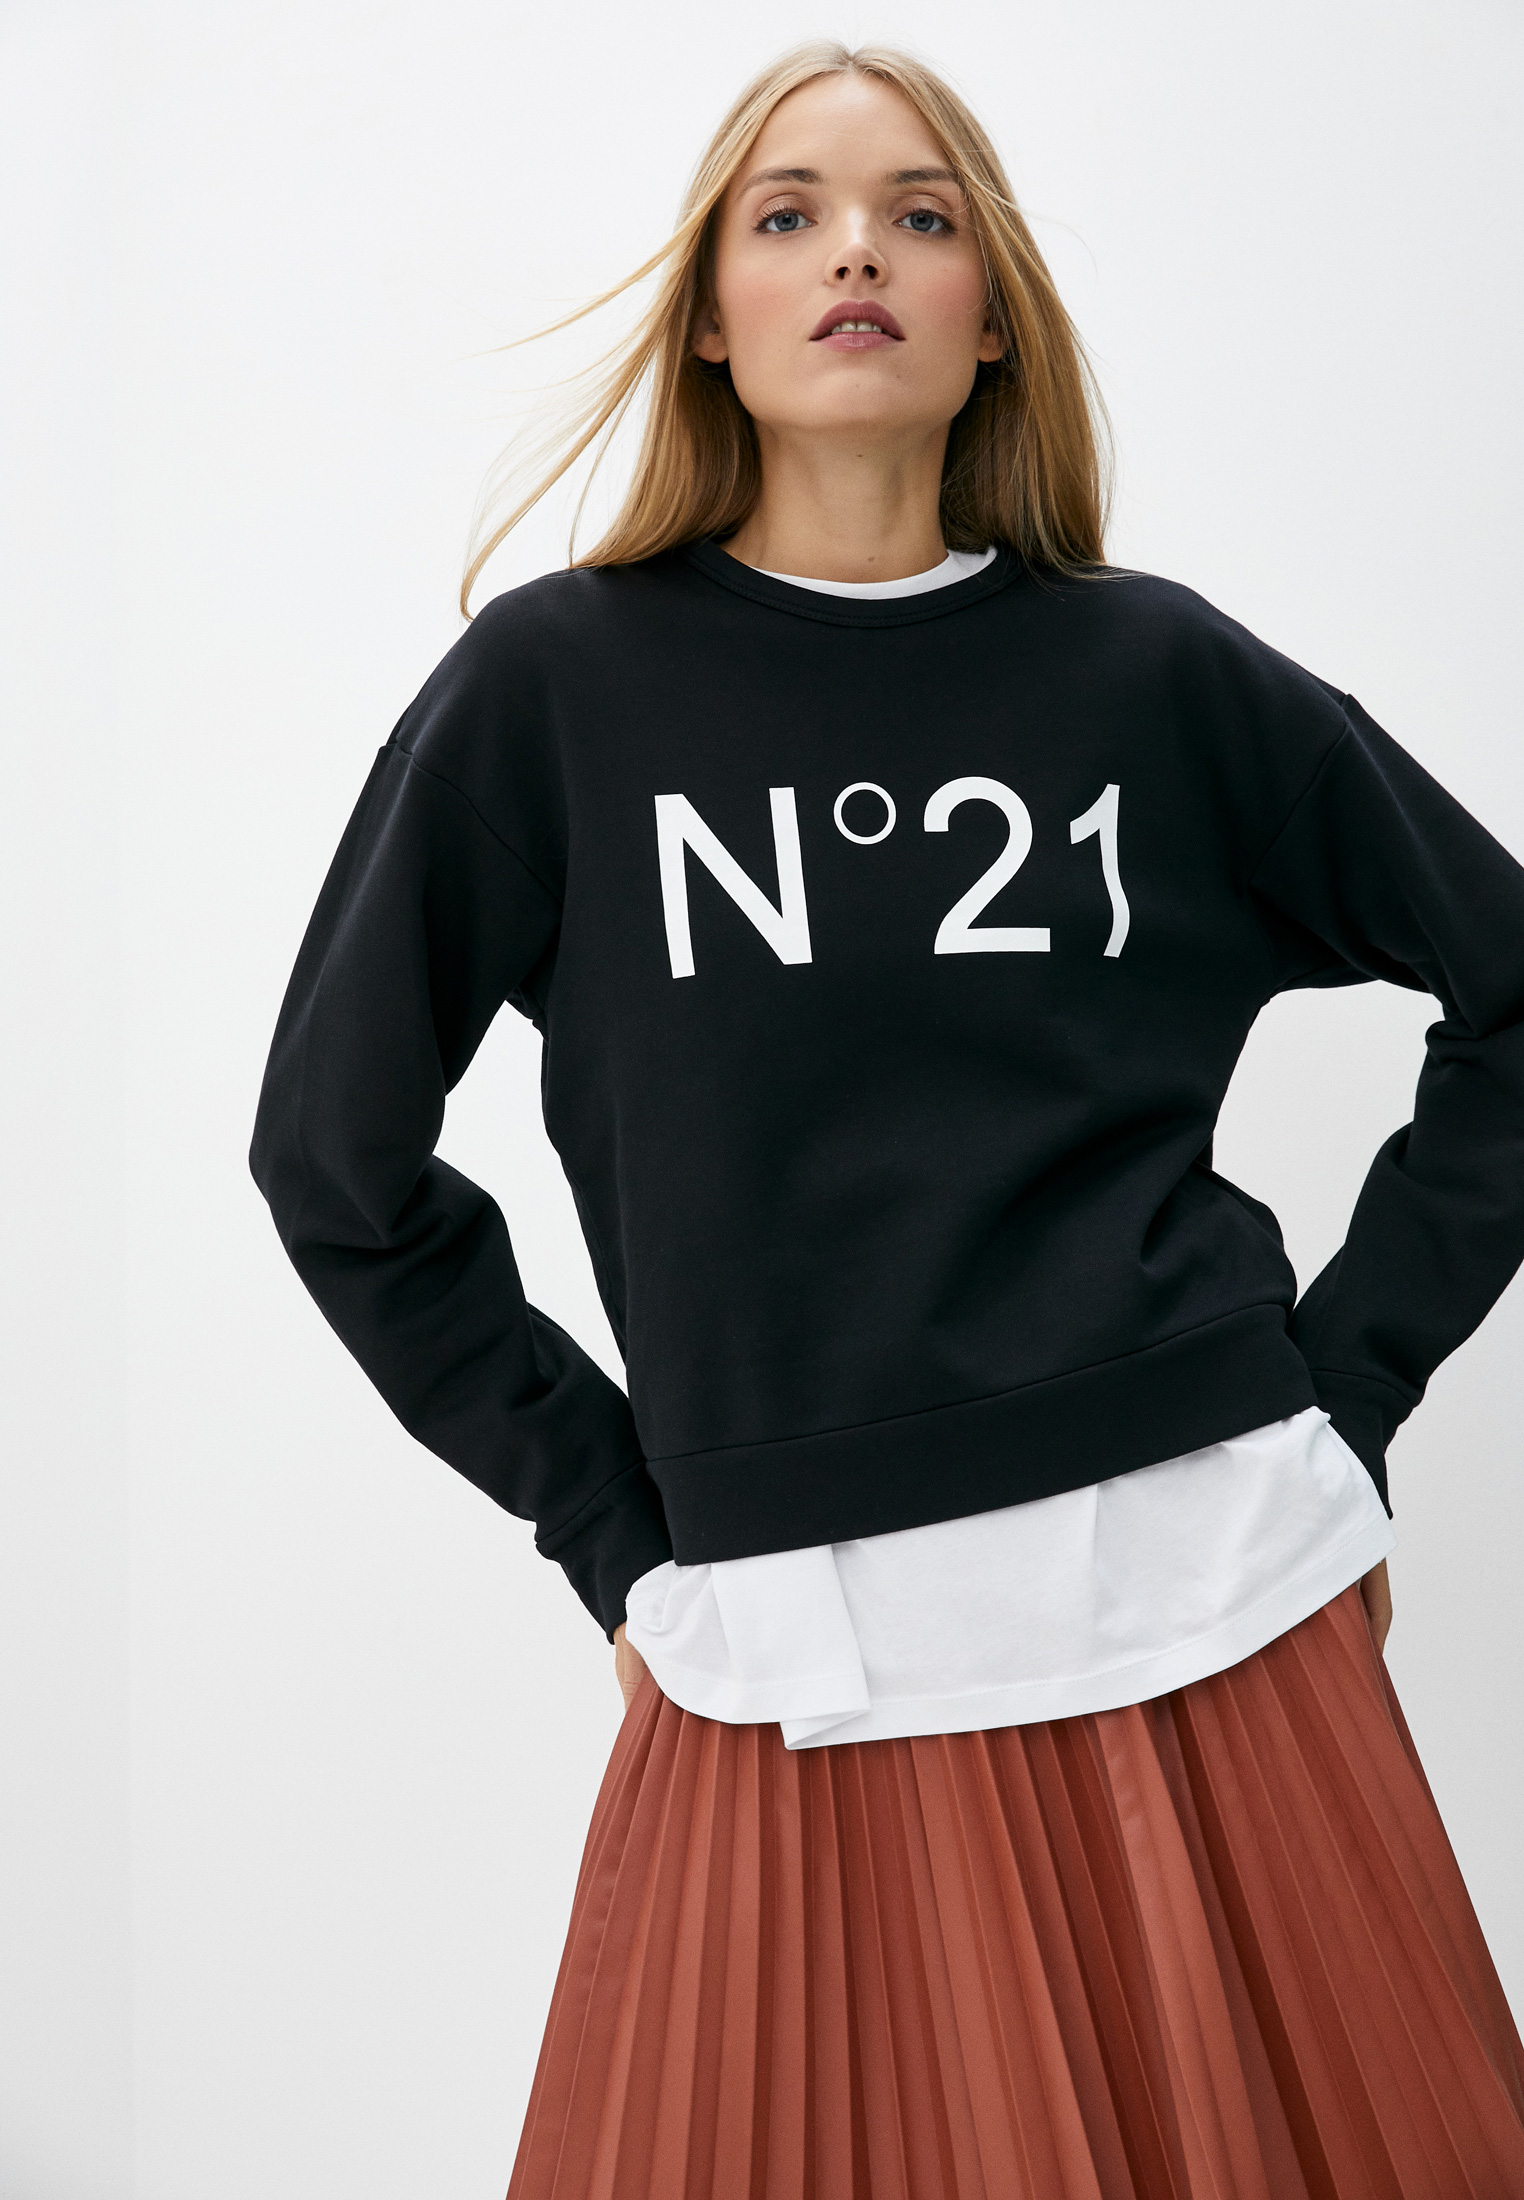 Свитер N21 n2pE021 6313